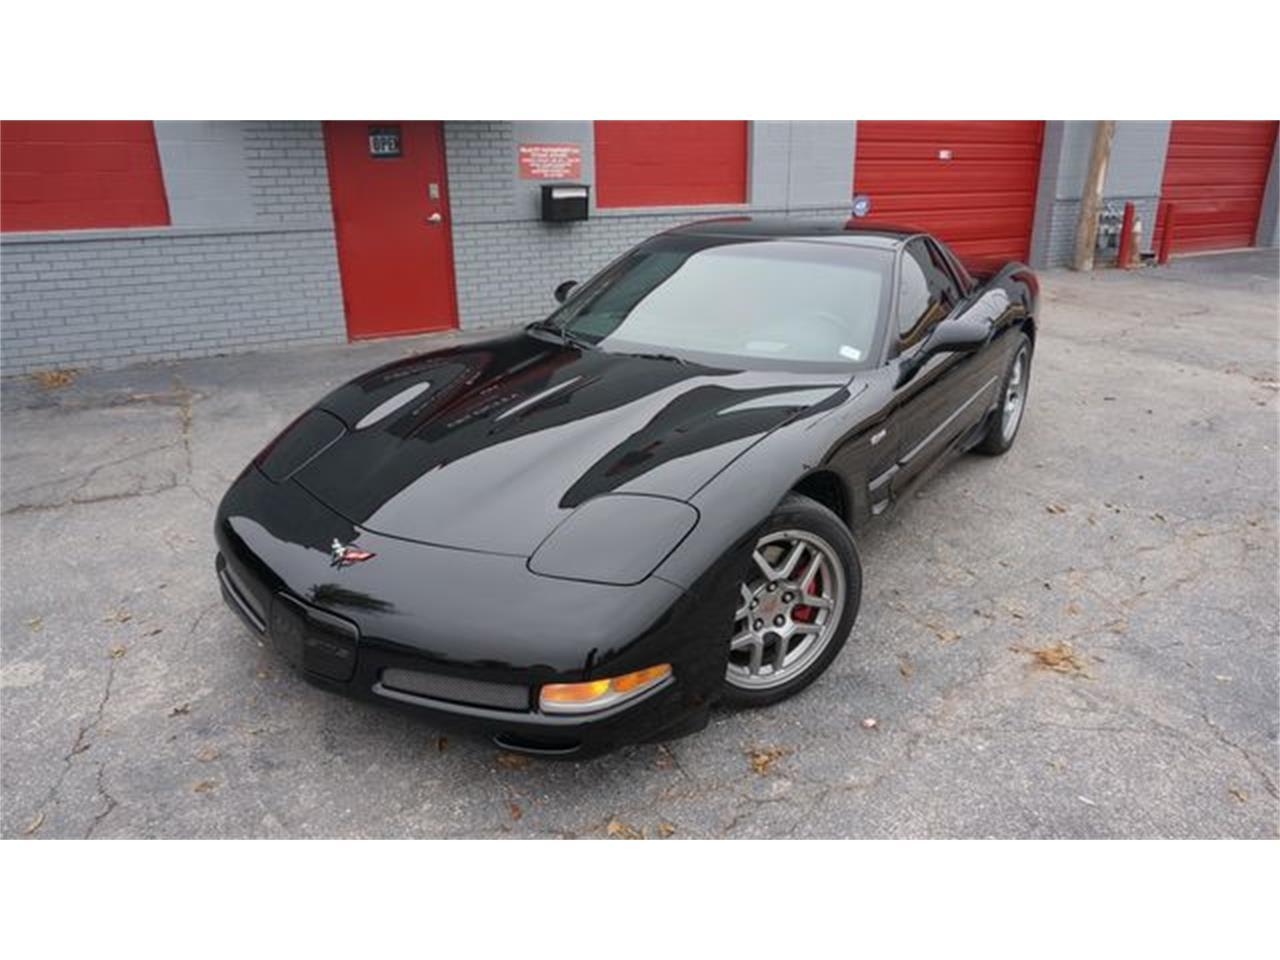 2004 Chevrolet Corvette (CC-1275191) for sale in Valley Park, Missouri